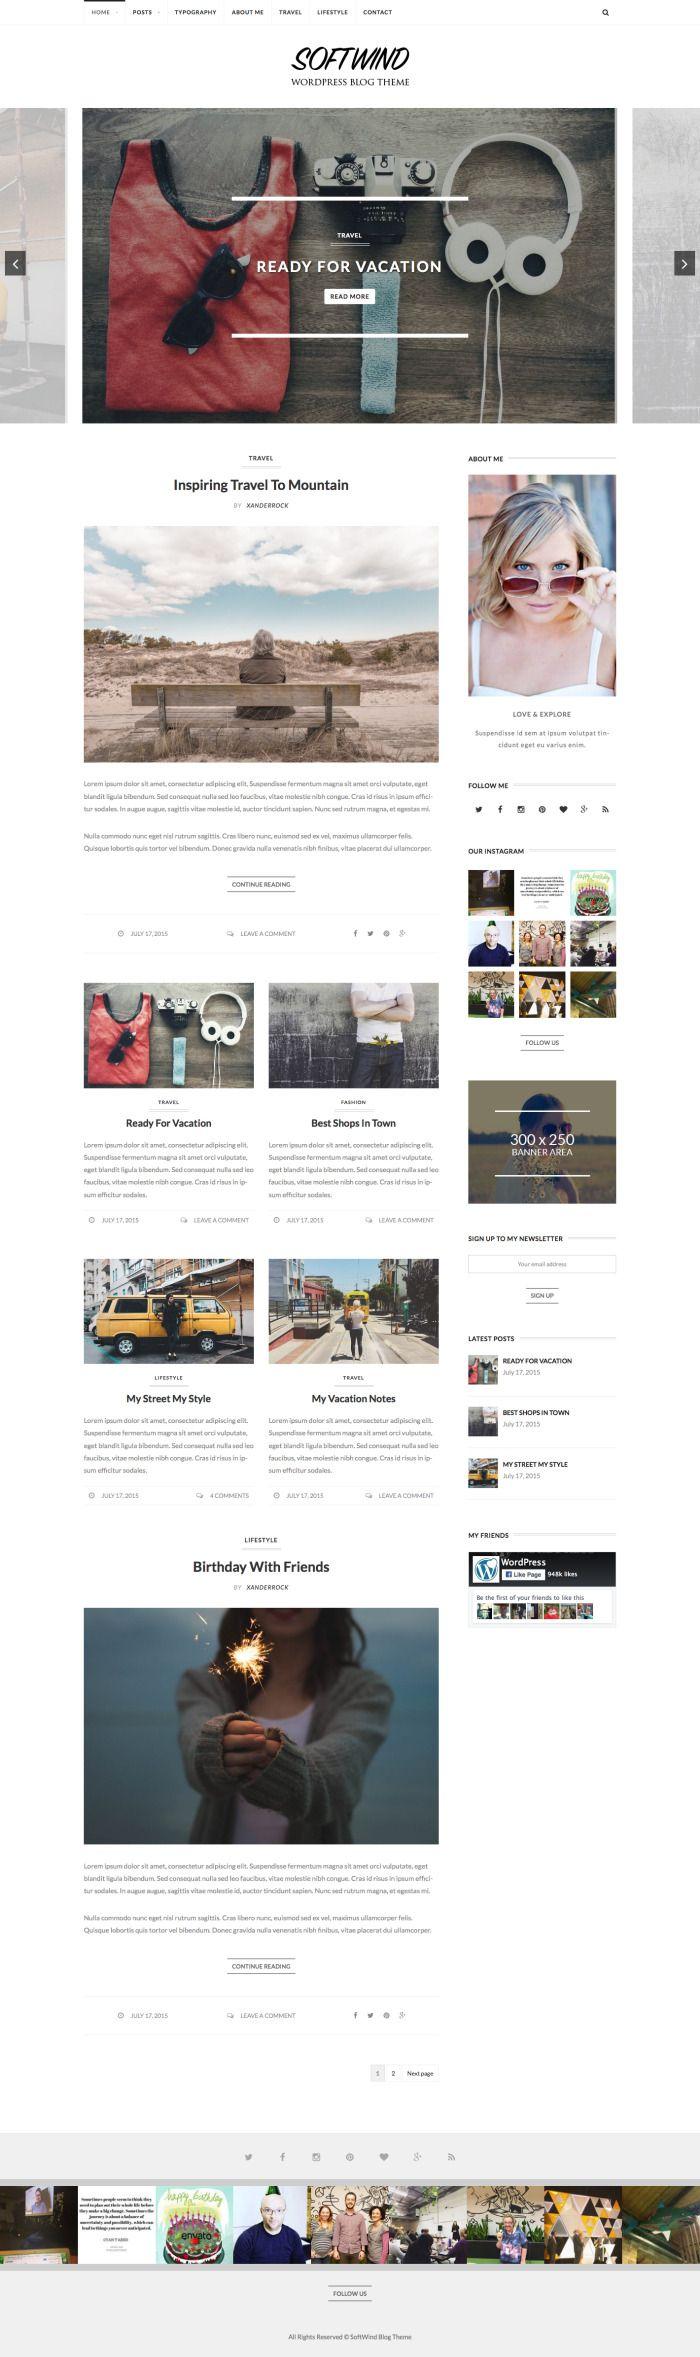 SoftWind – SEO Friendly WordPress Blog Theme